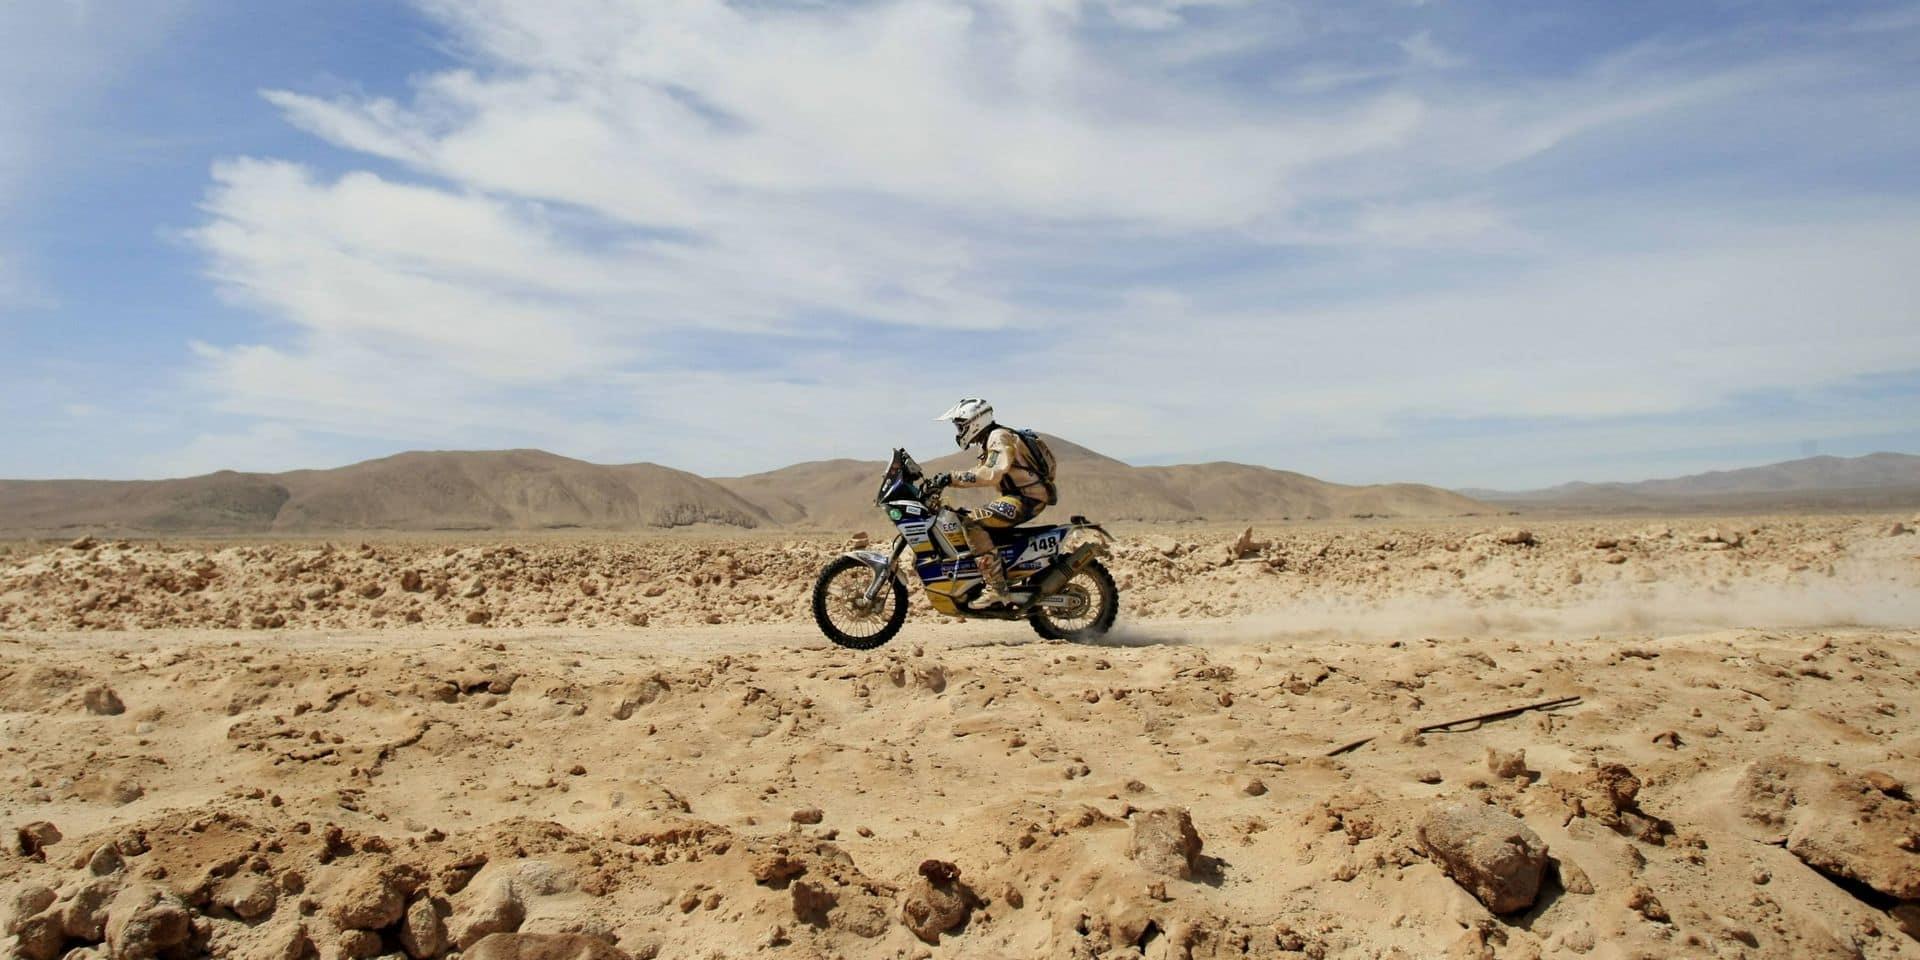 Rallye Dakar 2020 en Arabie saoudite, les droits humains dans la tempête